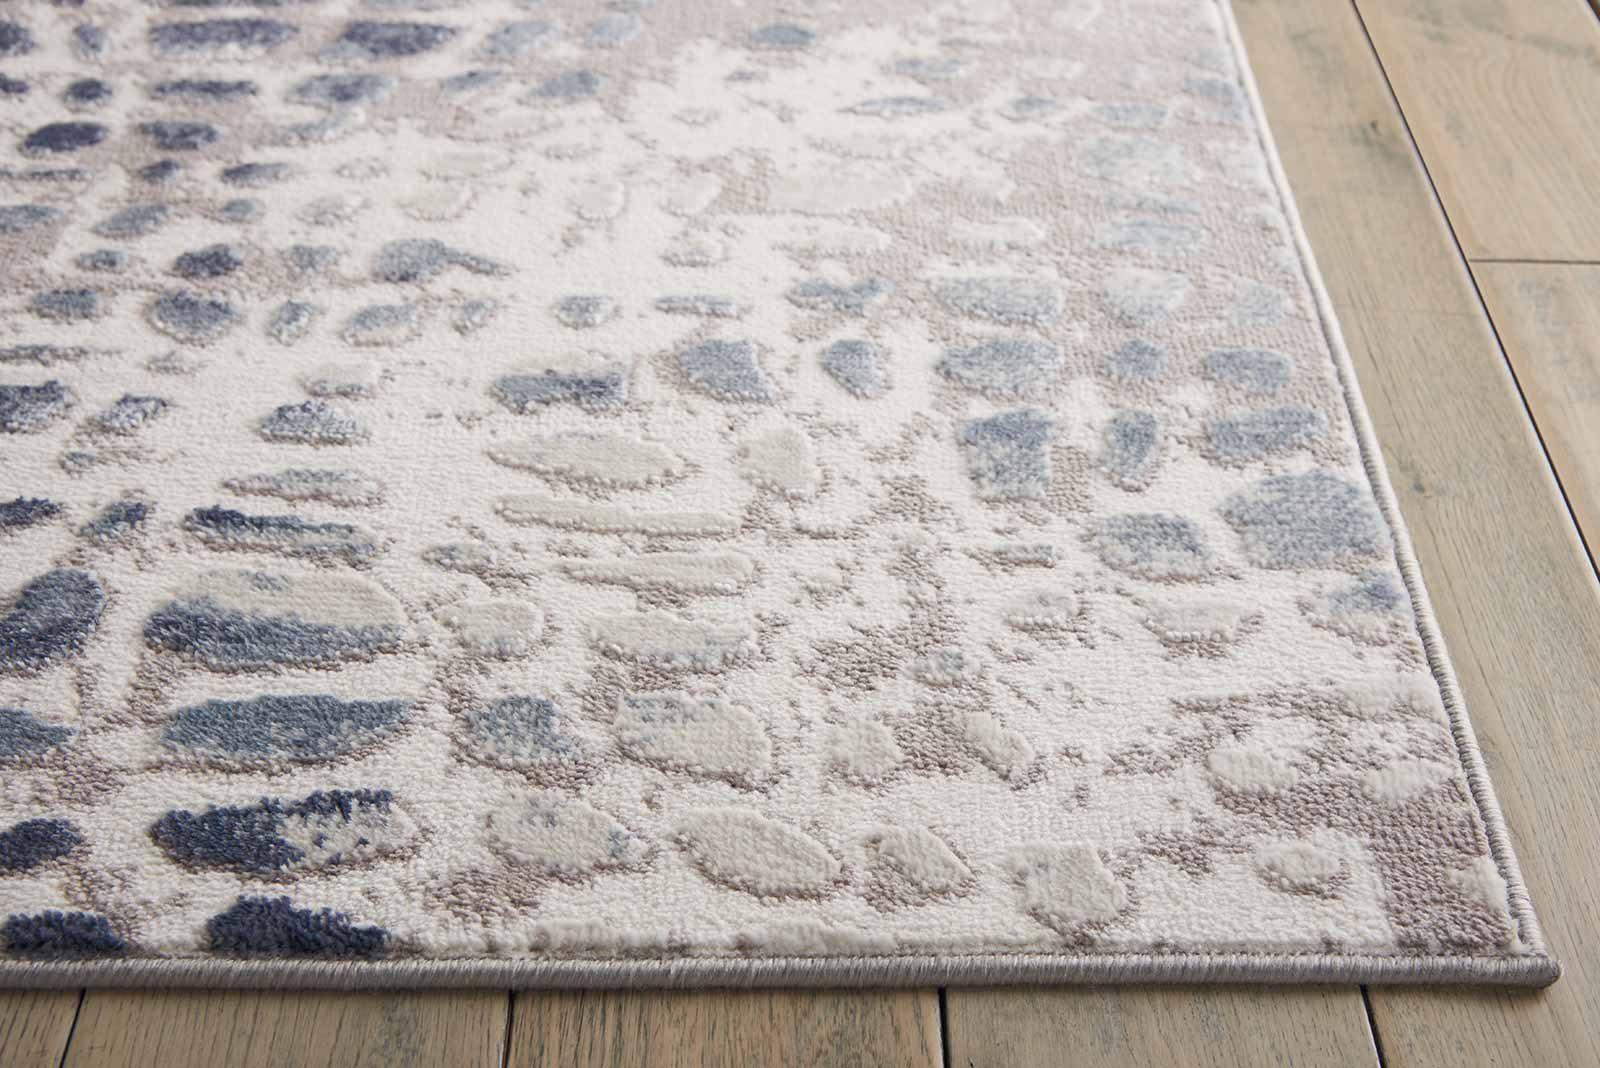 Nourison rug Urban Decor URD04 IVGRY 5x7 099446467119 main 5